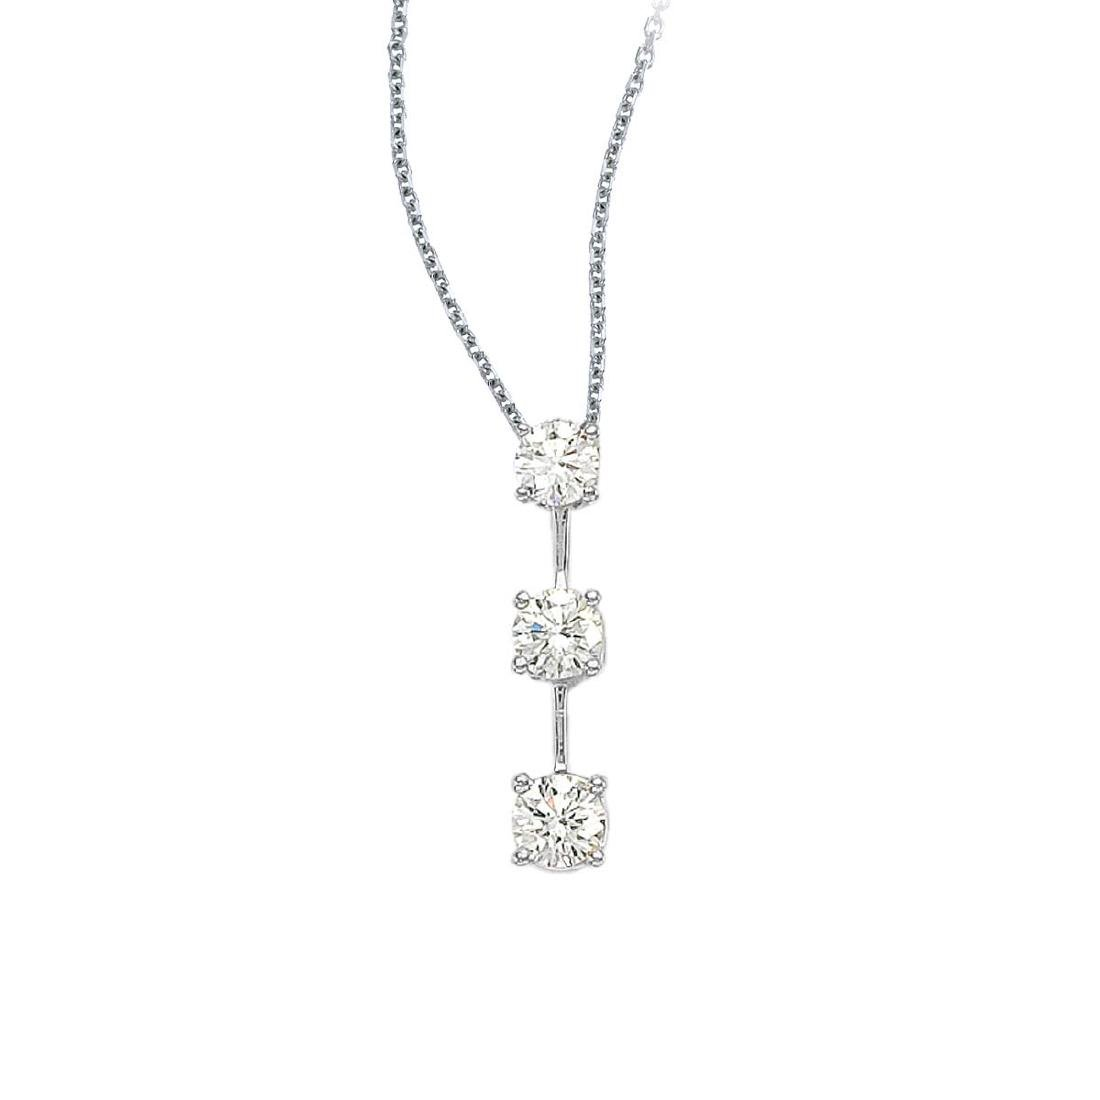 Certified 14k White Gold 3 Stone Diamond Drop Pendant